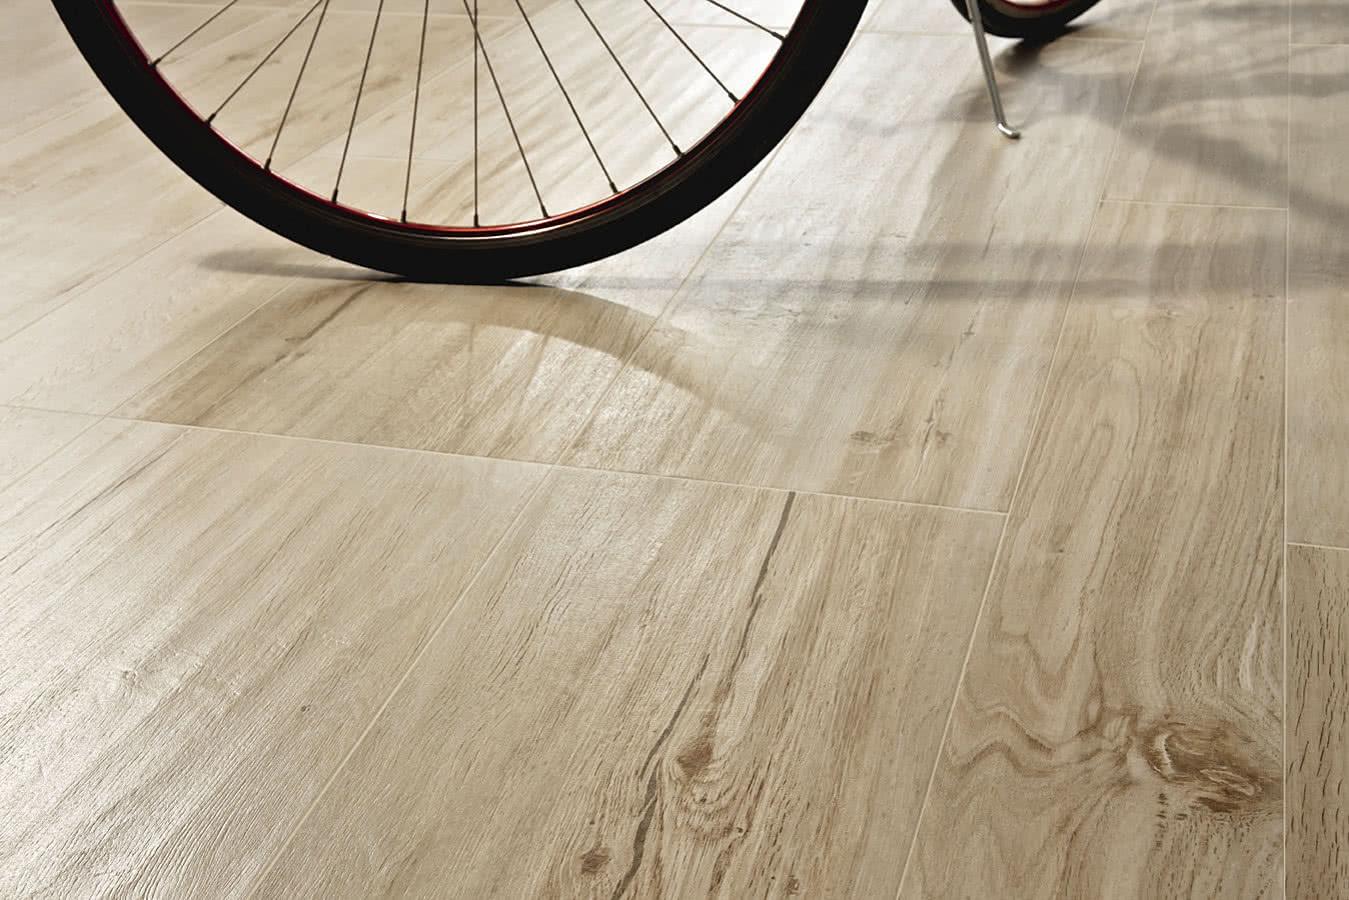 Root de caesar tile expert fournisseur de carrelage for Fournisseur carrelage